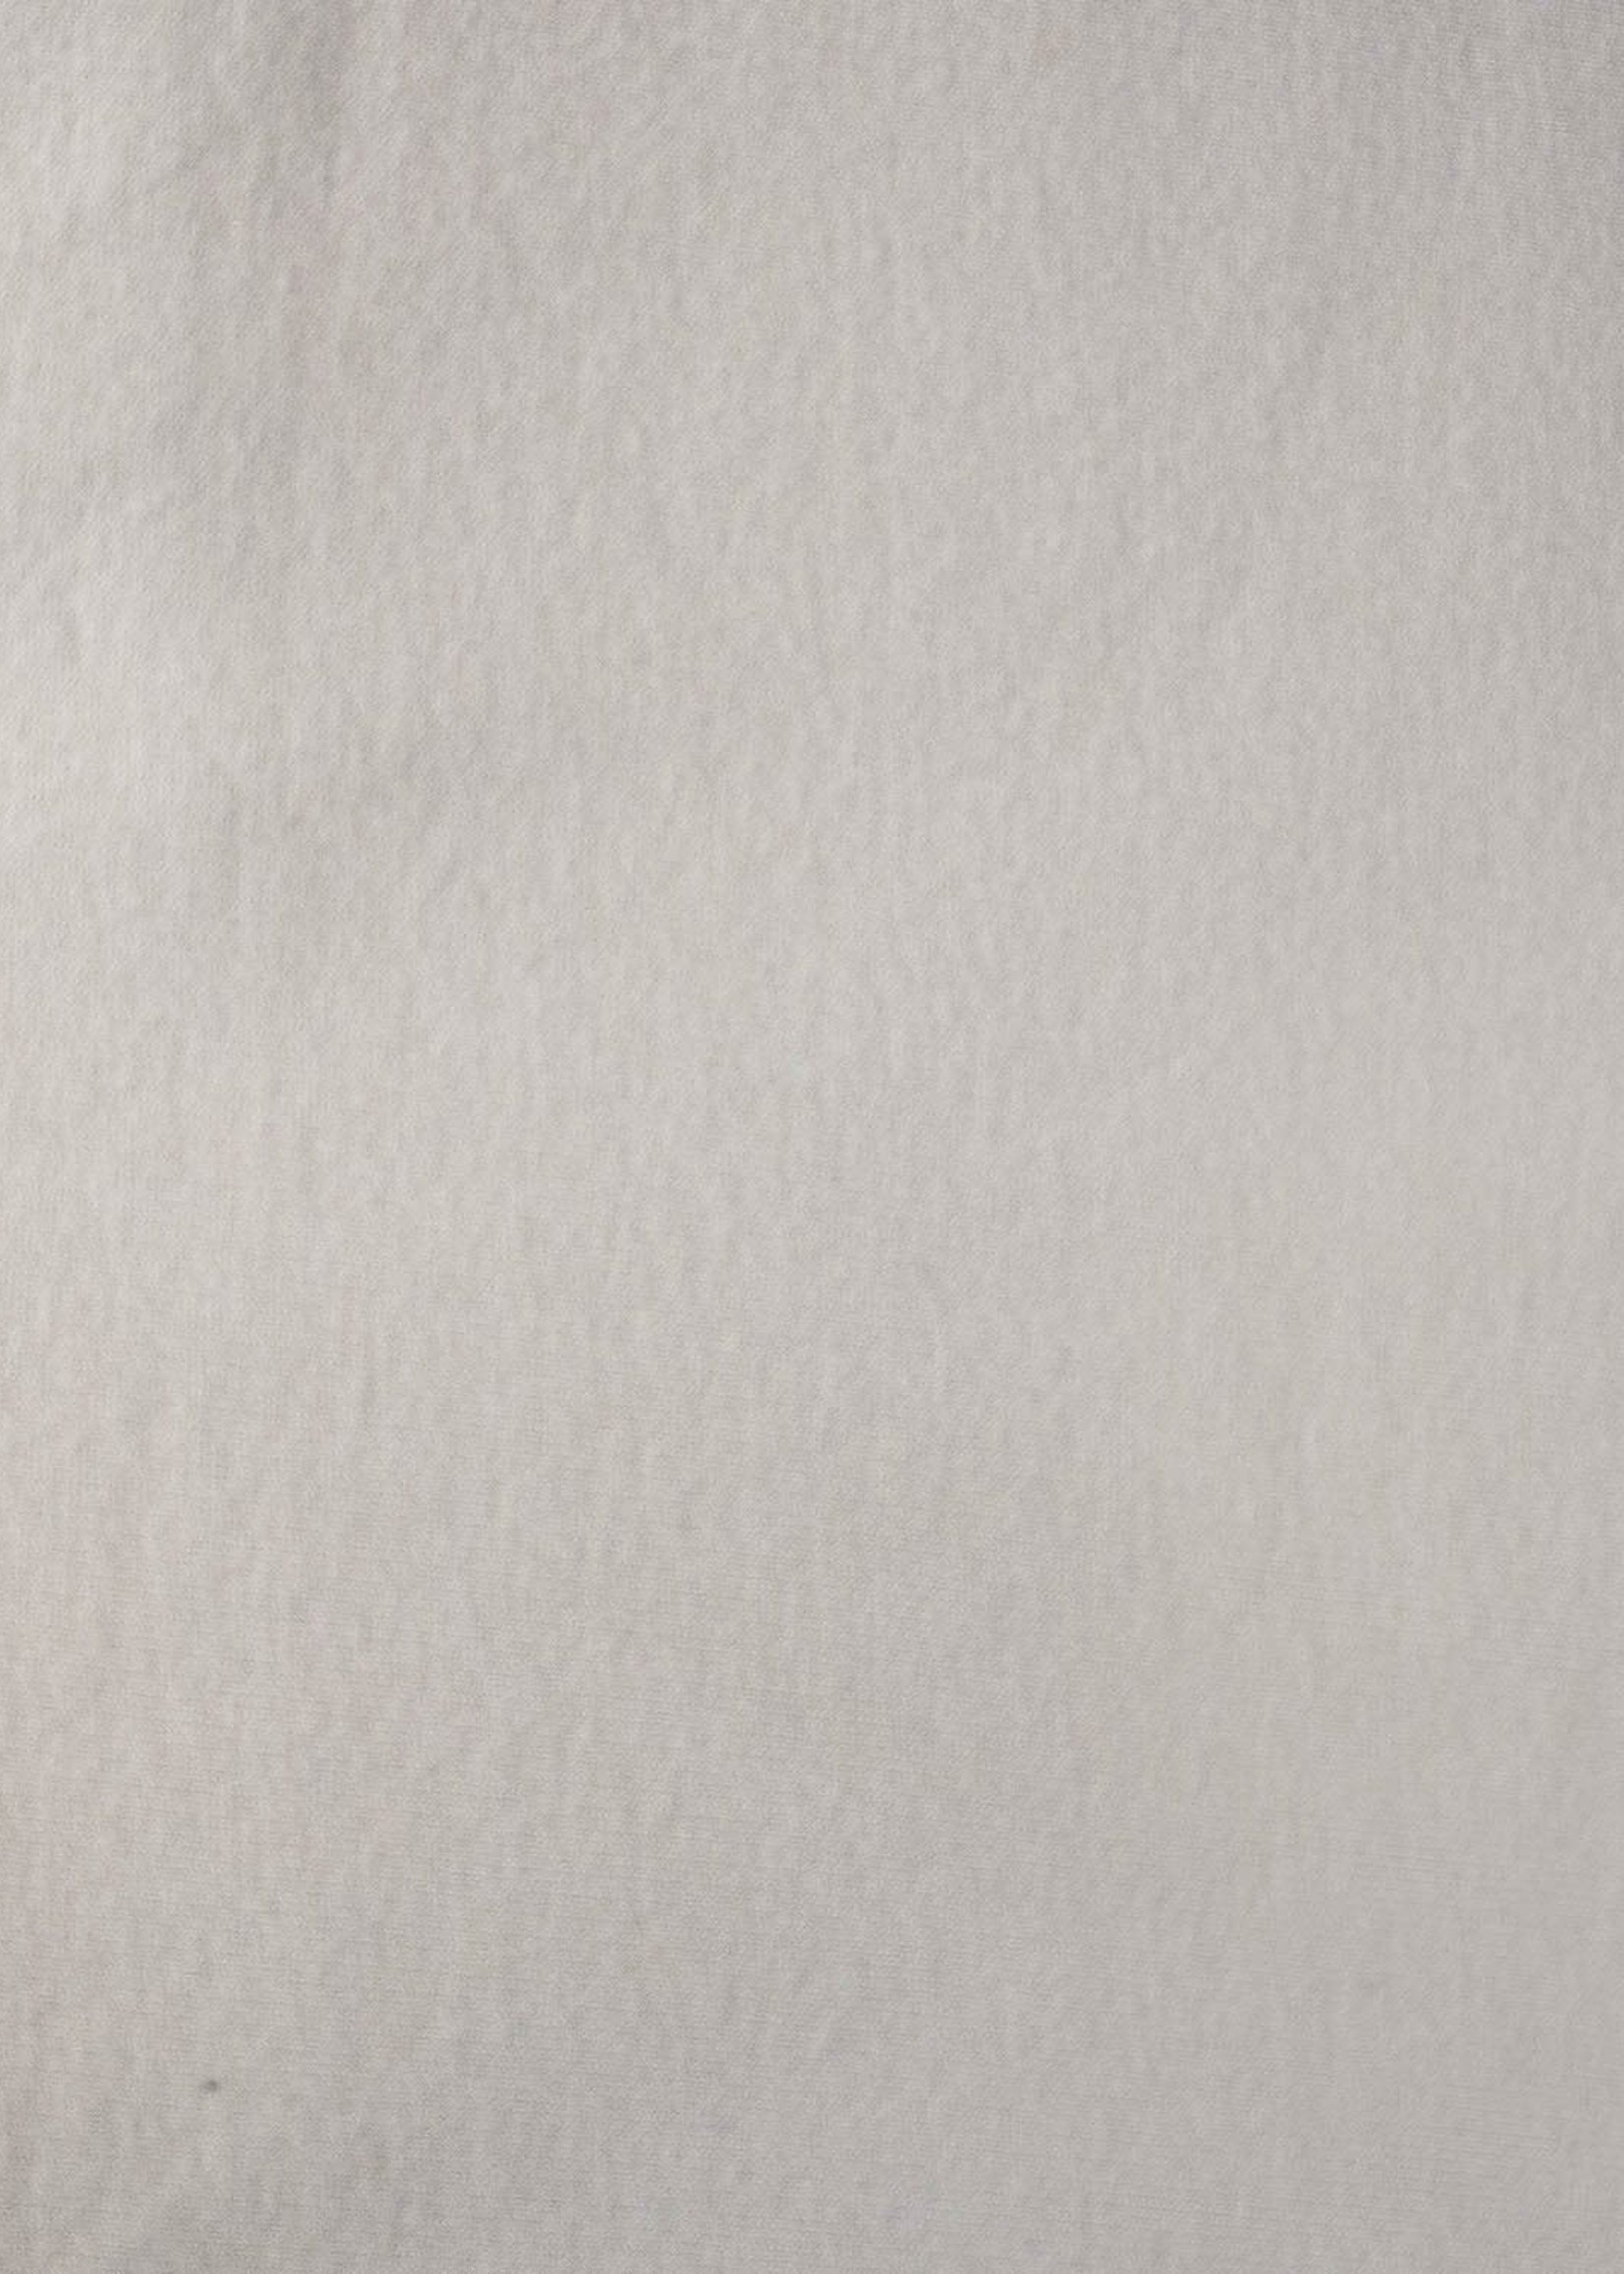 Katia Fabrics SOFT FRENCH TERRY SOLID STONE